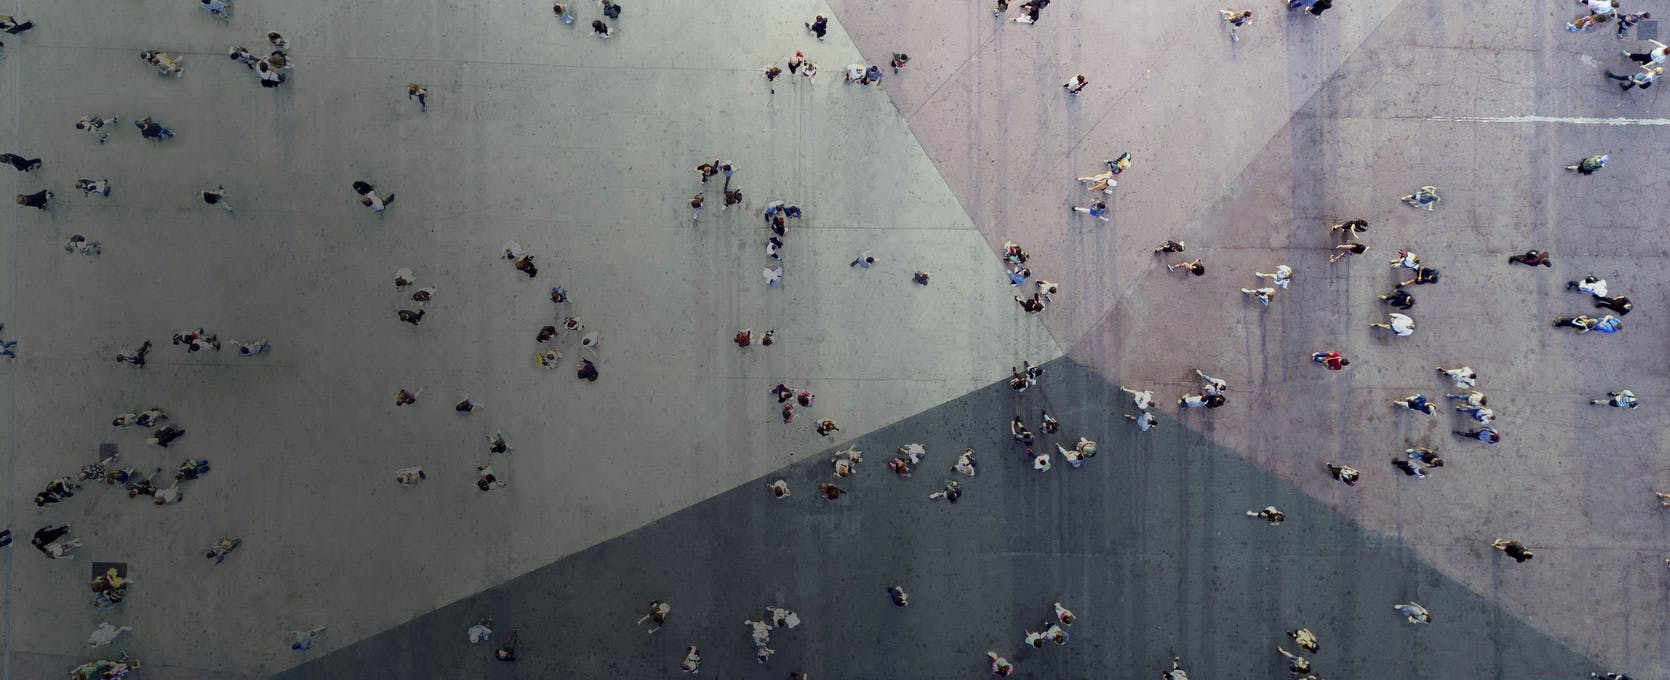 Crowded city plaza